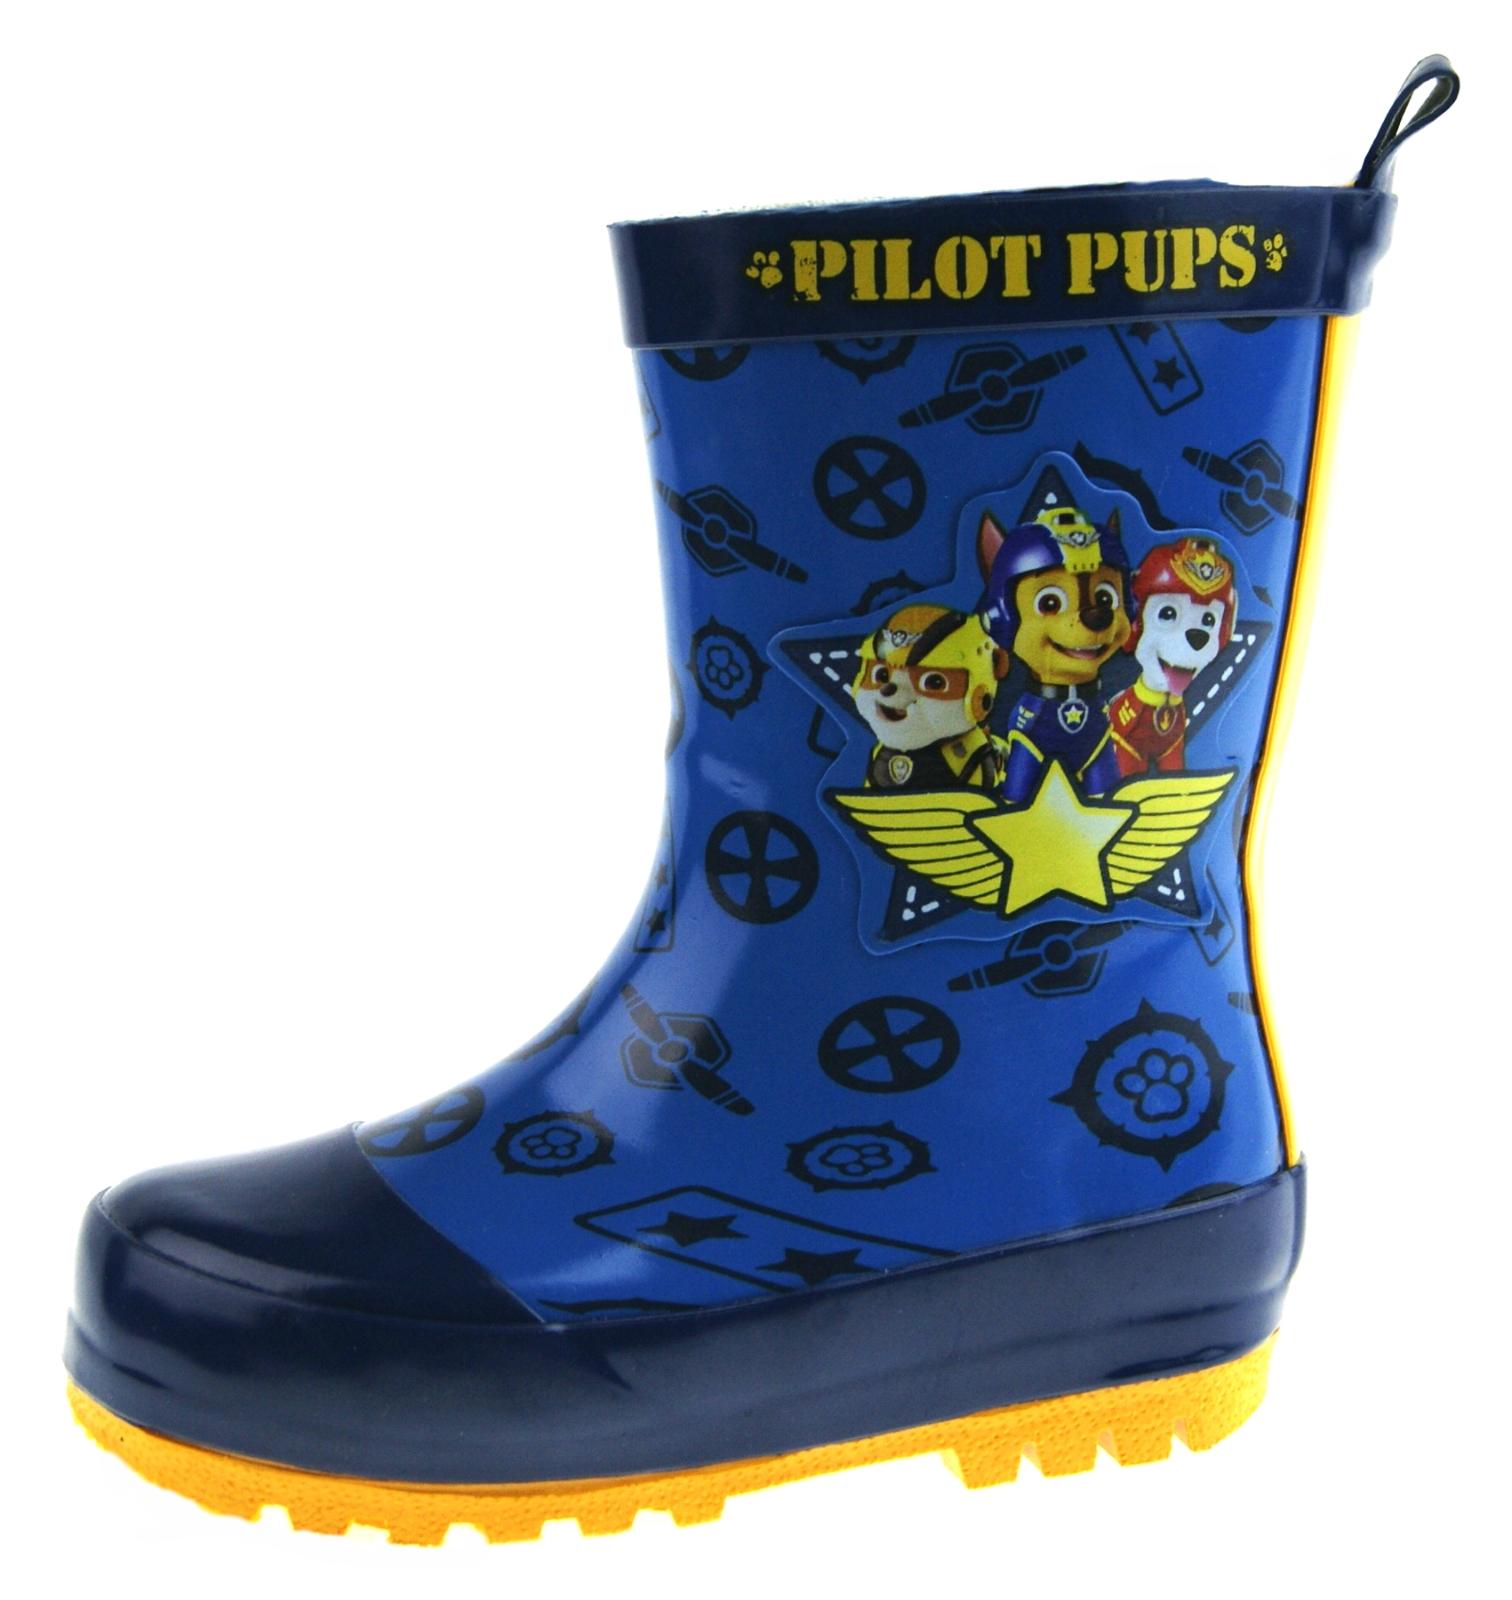 Boys Paw Patrol Wellington Boots Blue Rubber Rain Wellies Snow Boots Kids Size